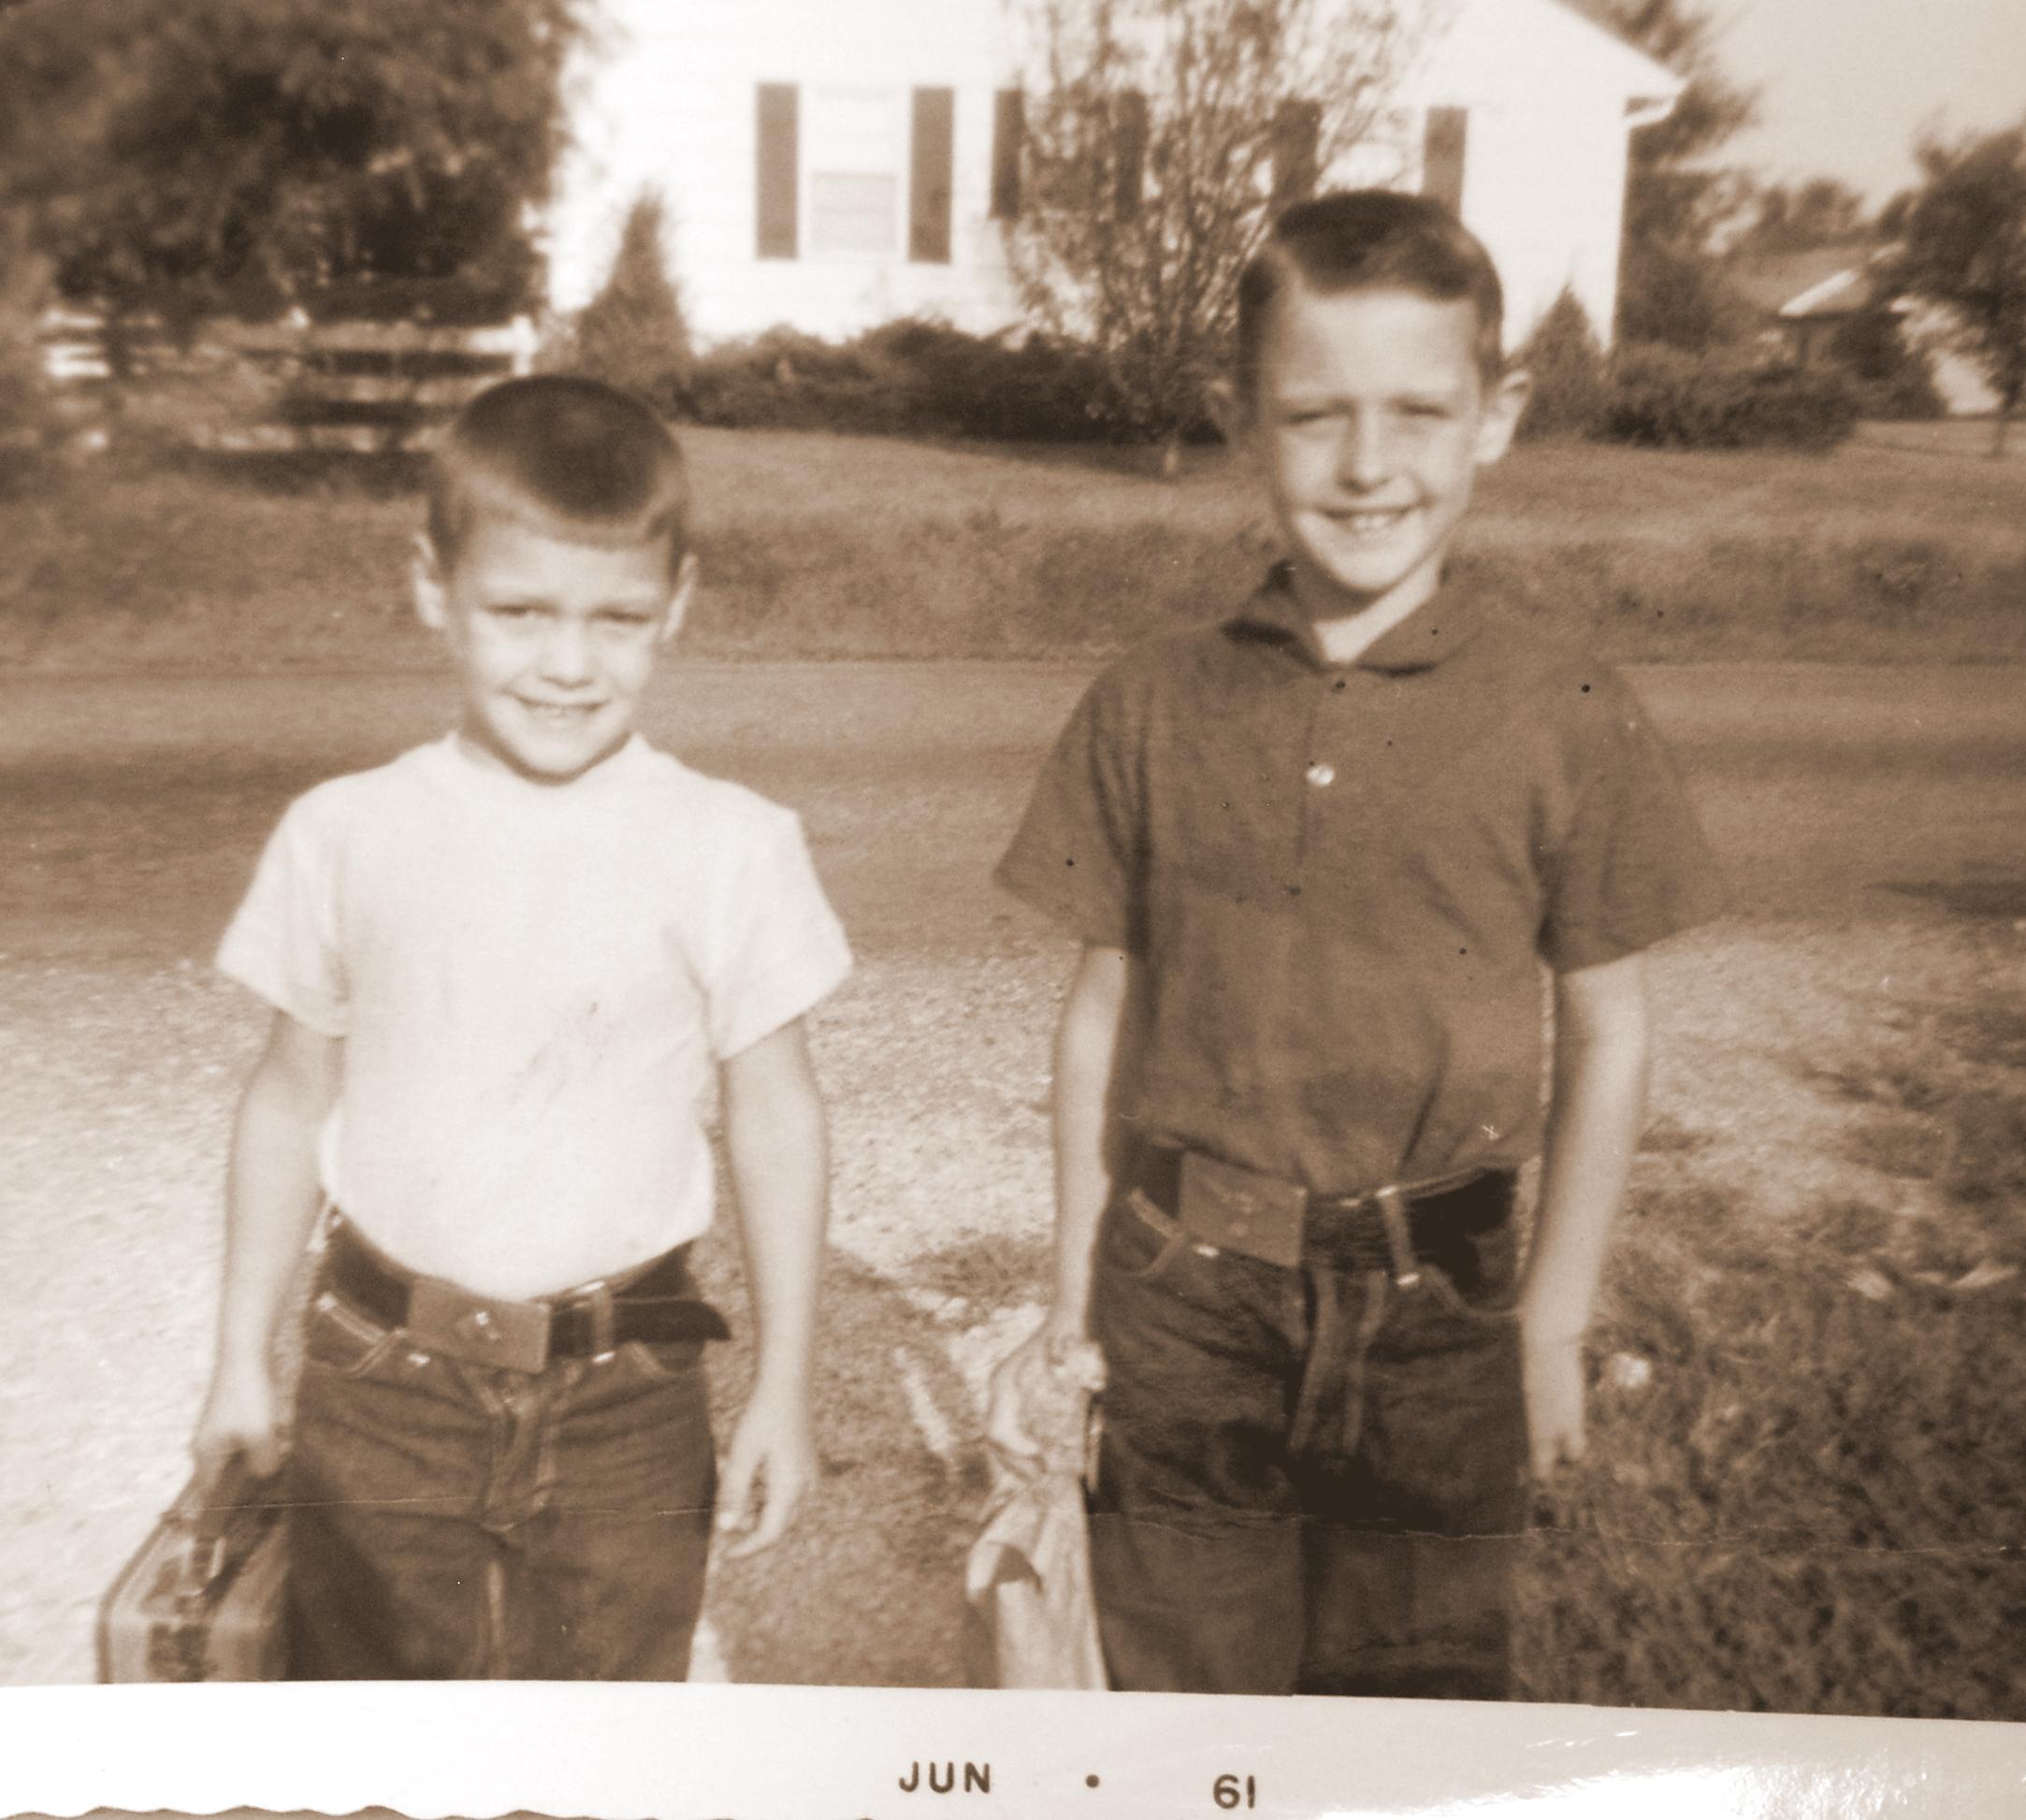 Jim and John to School